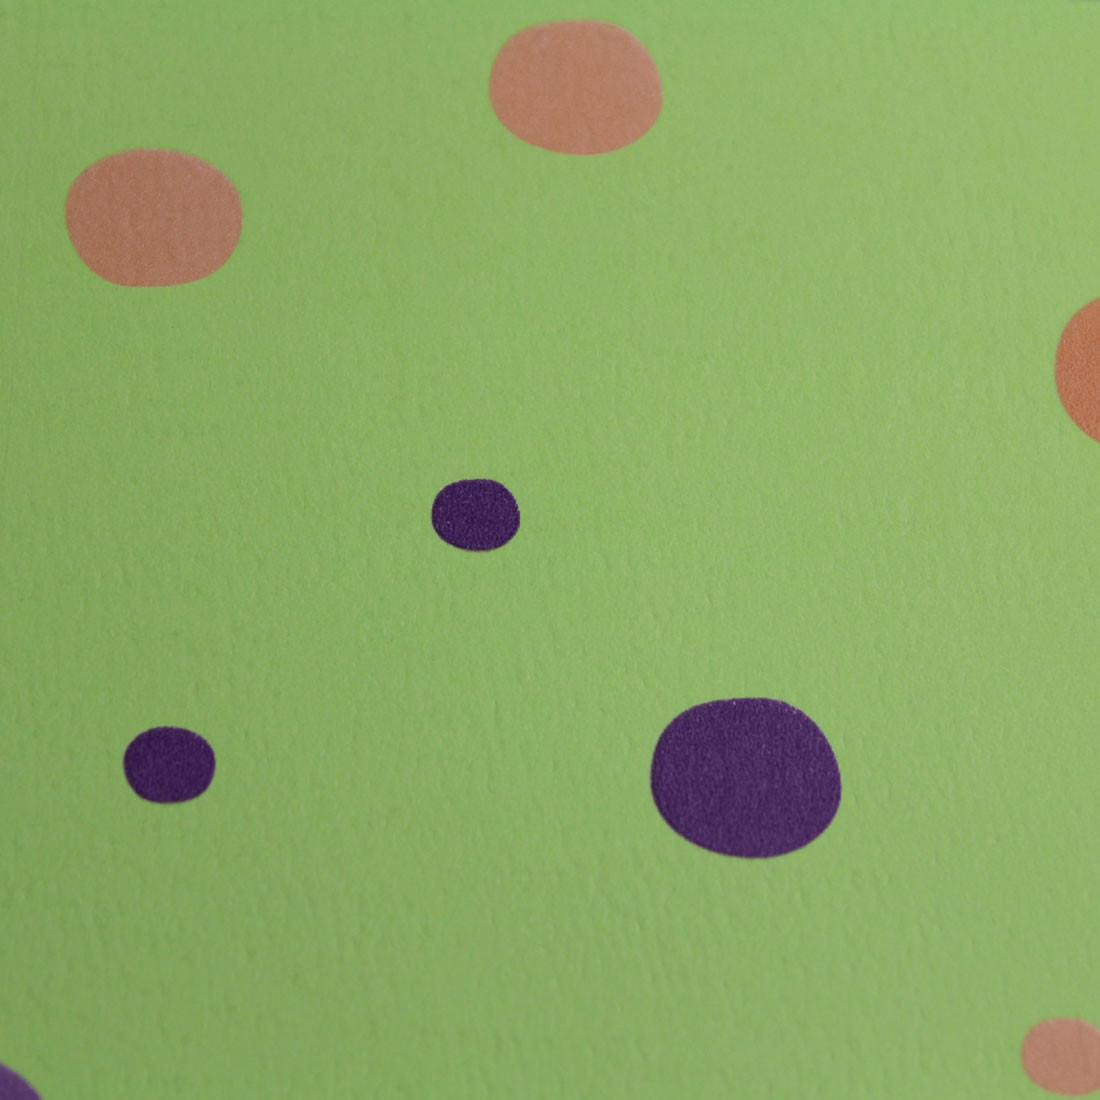 Papel de Parede Infantil Bolinhas Verdes - Has#Tag